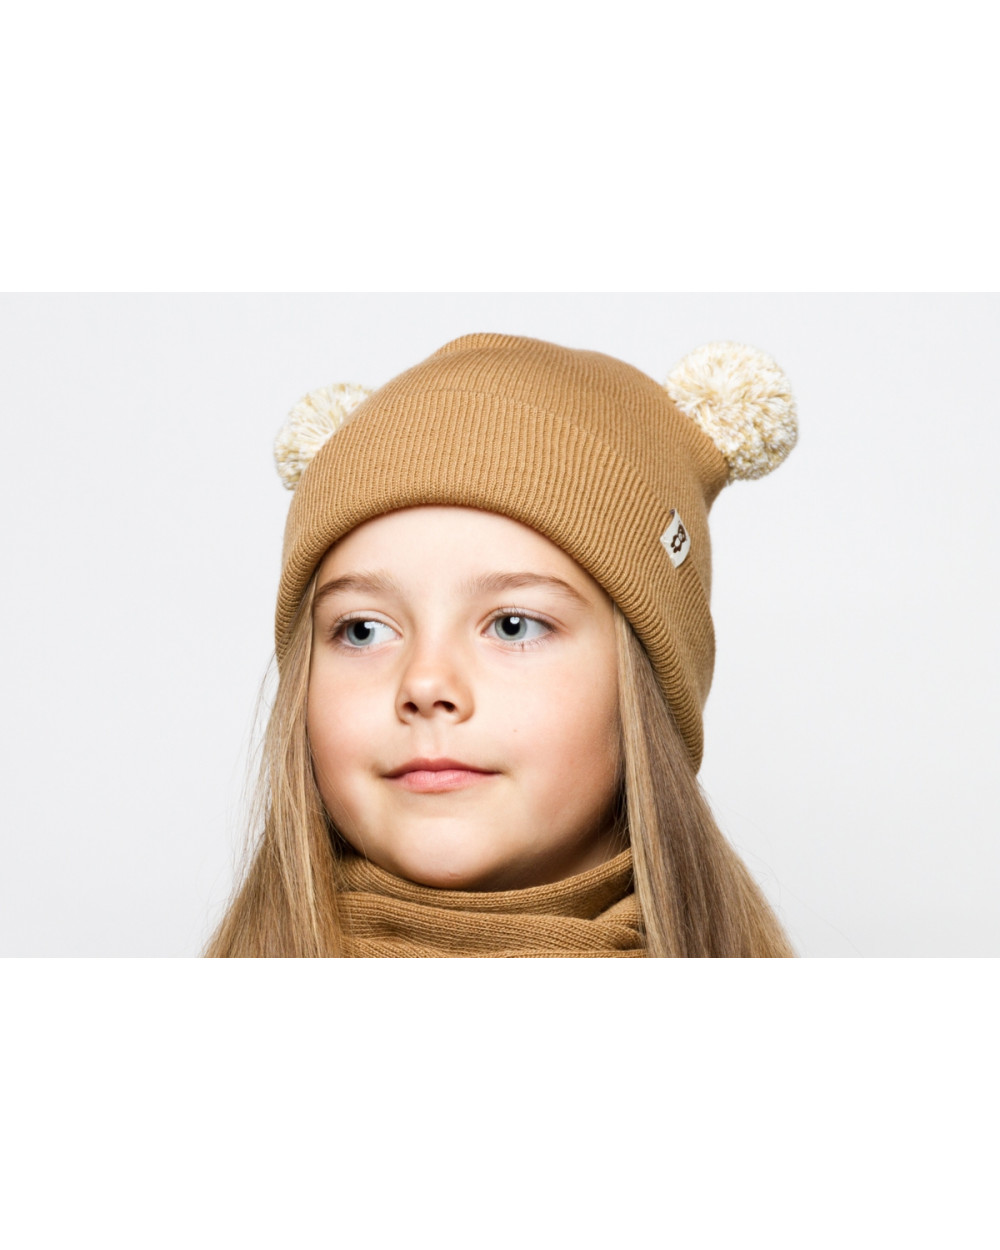 Vaikiška kepurė su dviem bumbulais